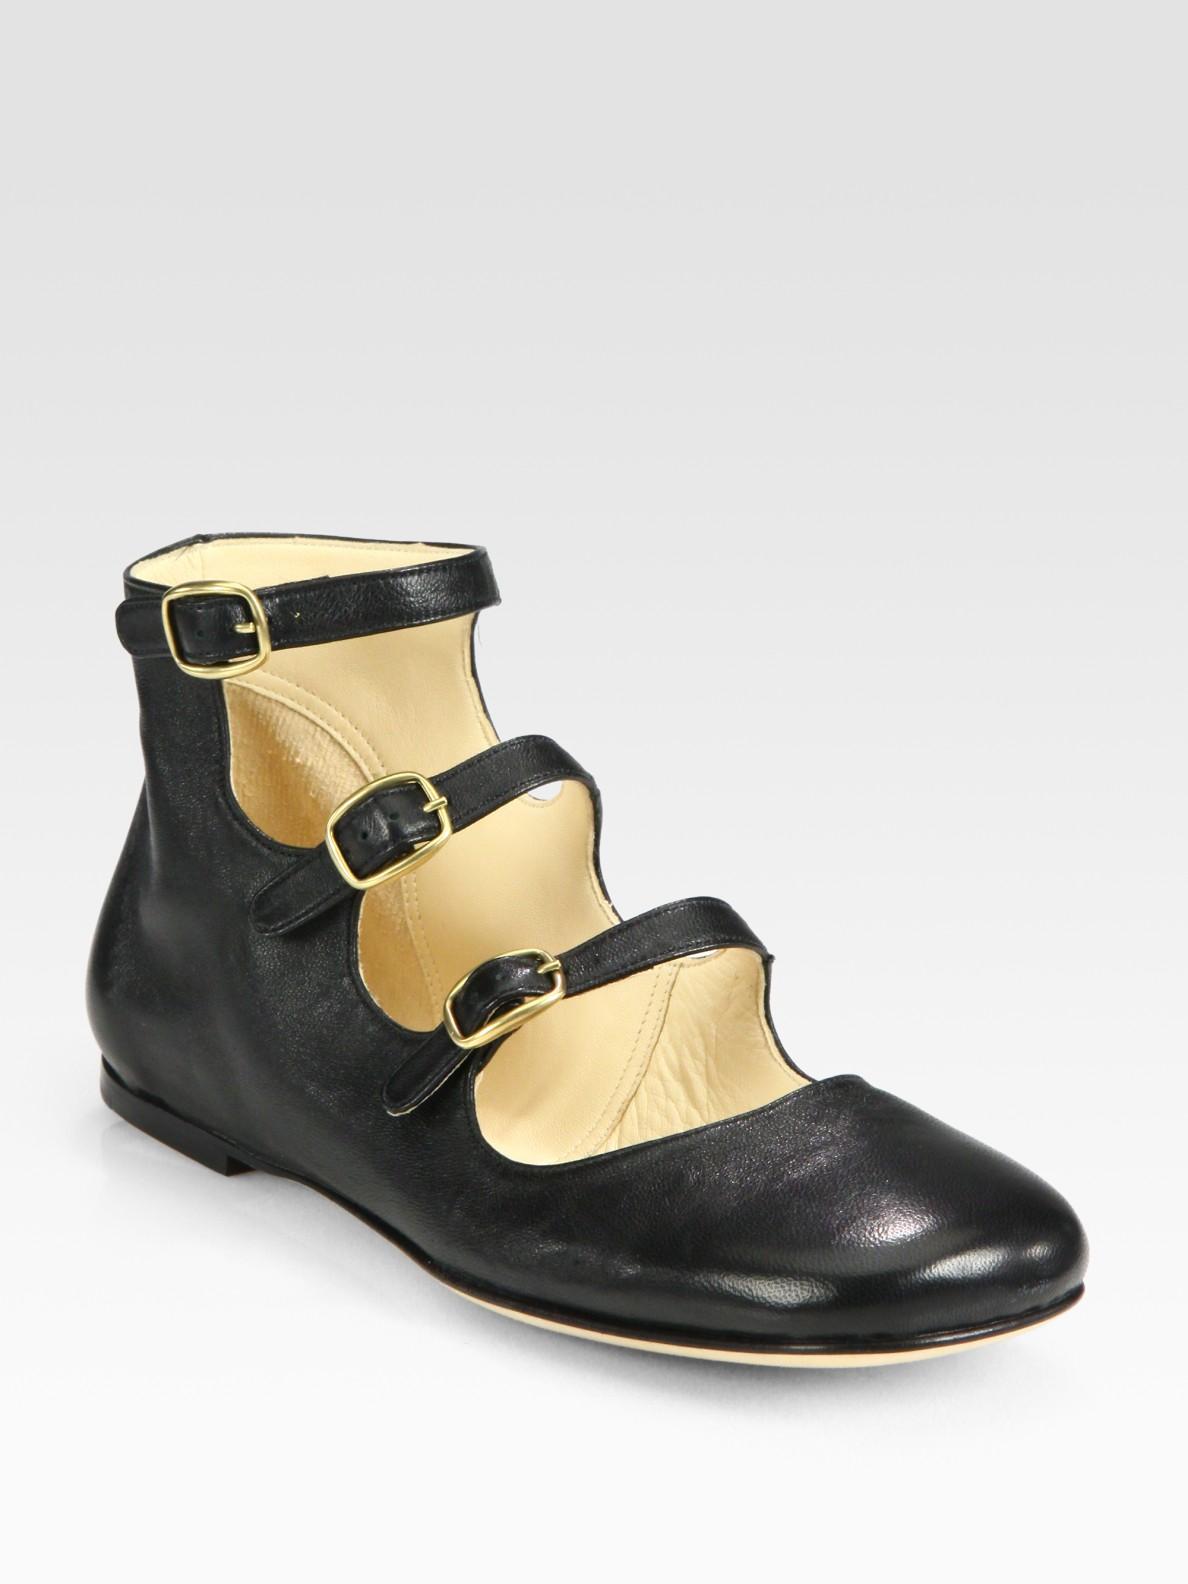 947763645a50 Lyst - Chloé Leather Triple Buckle Strap Ballet Flats in Black